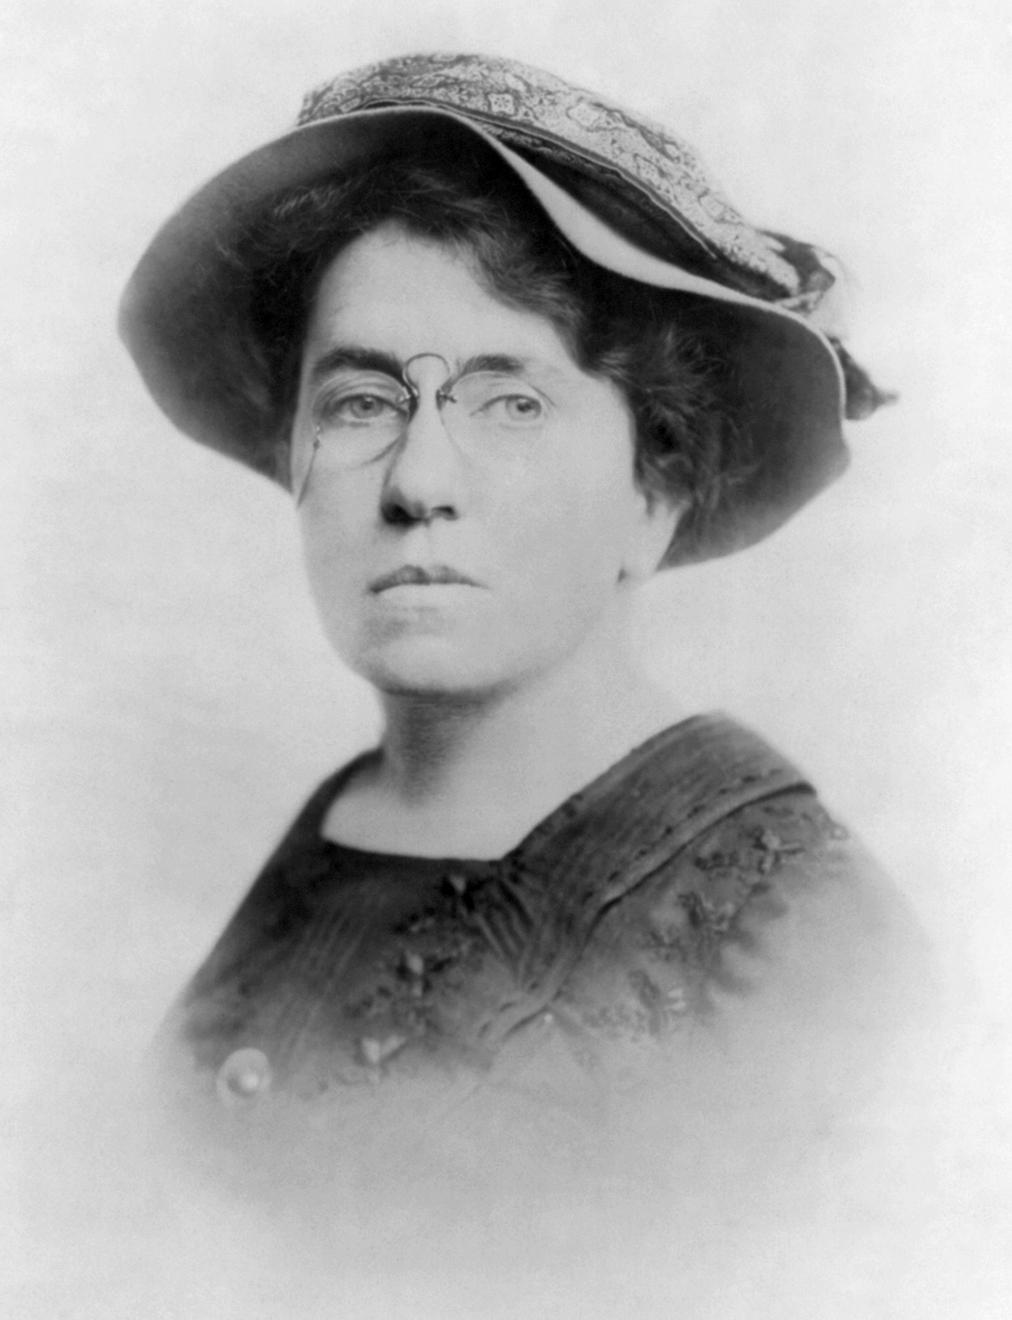 006 Emma Goldman 2 Anarchism And Other Essays Essay Incredible Summary Pdf Full